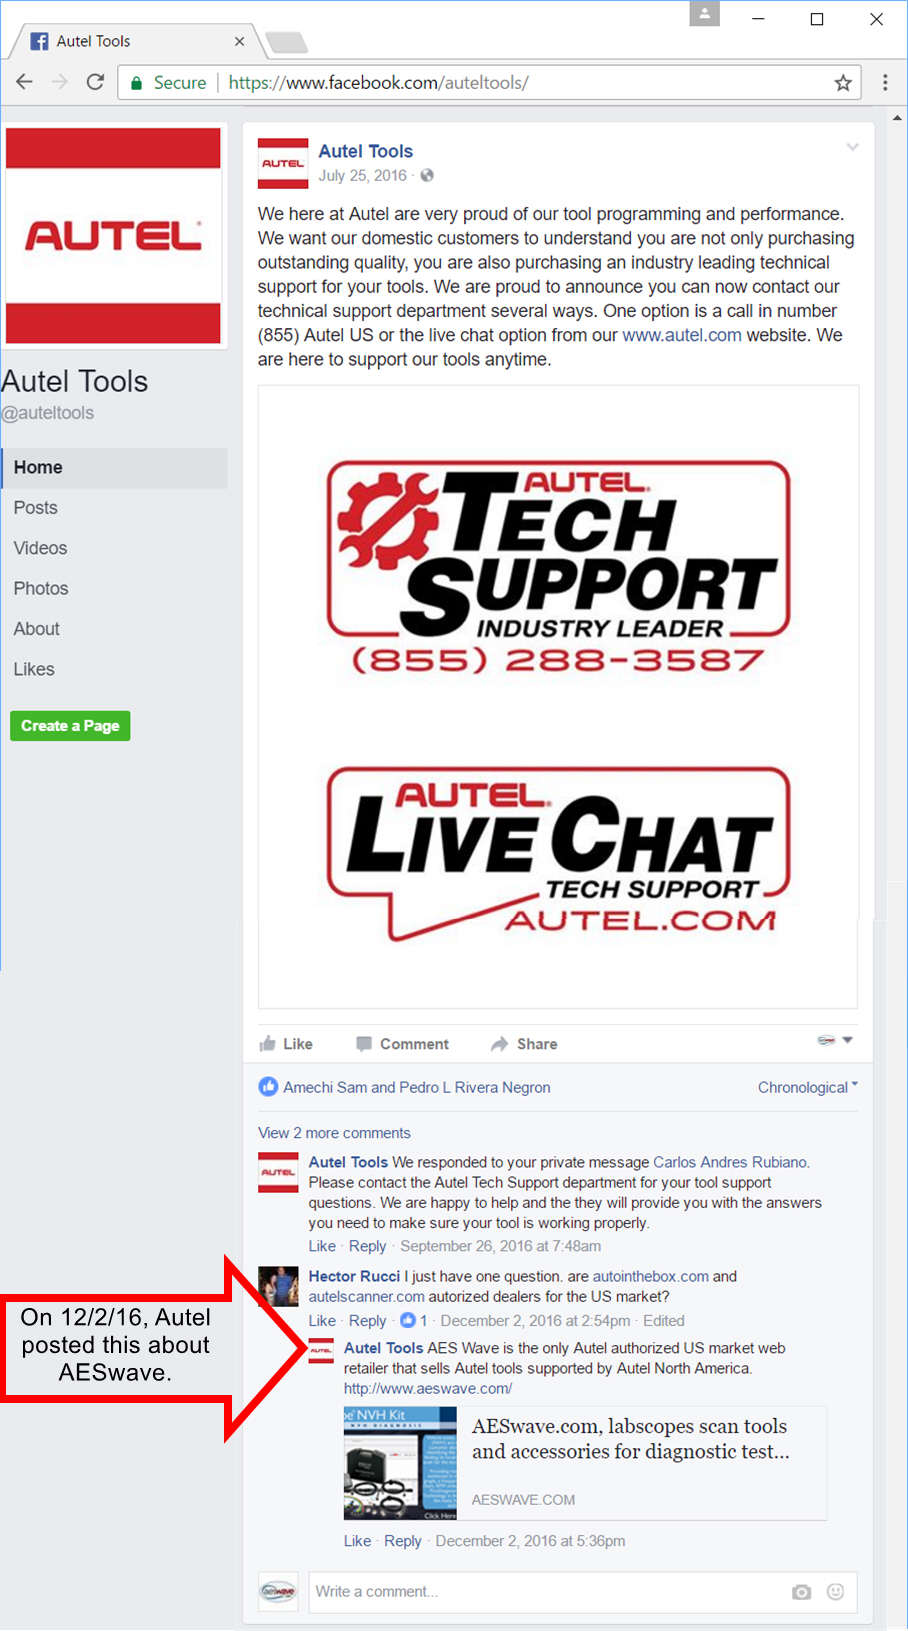 Autel's Facebook page